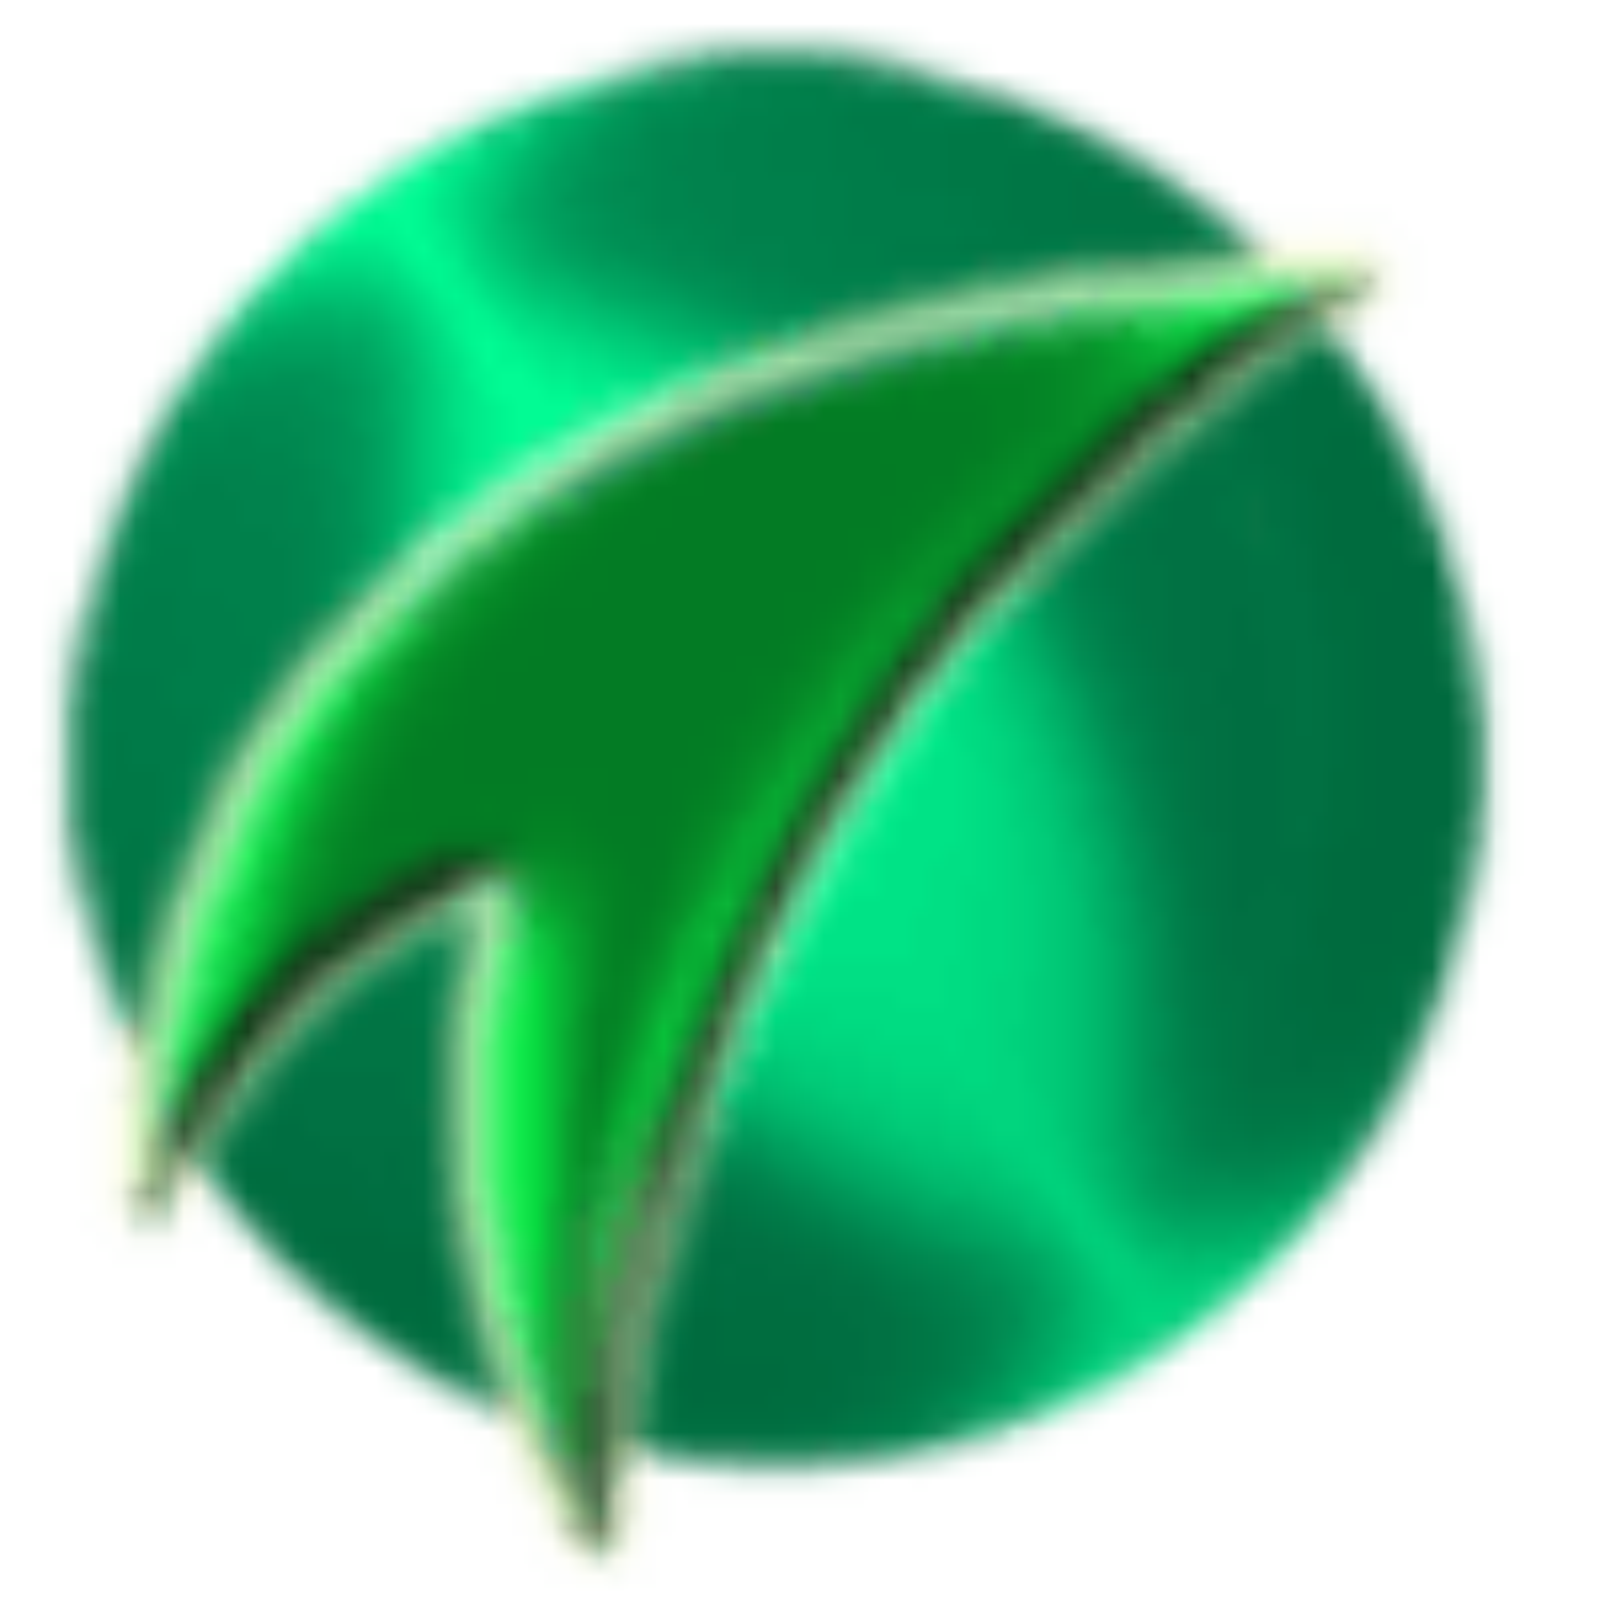 W32/Gimemo Free Trojan Removal Tool